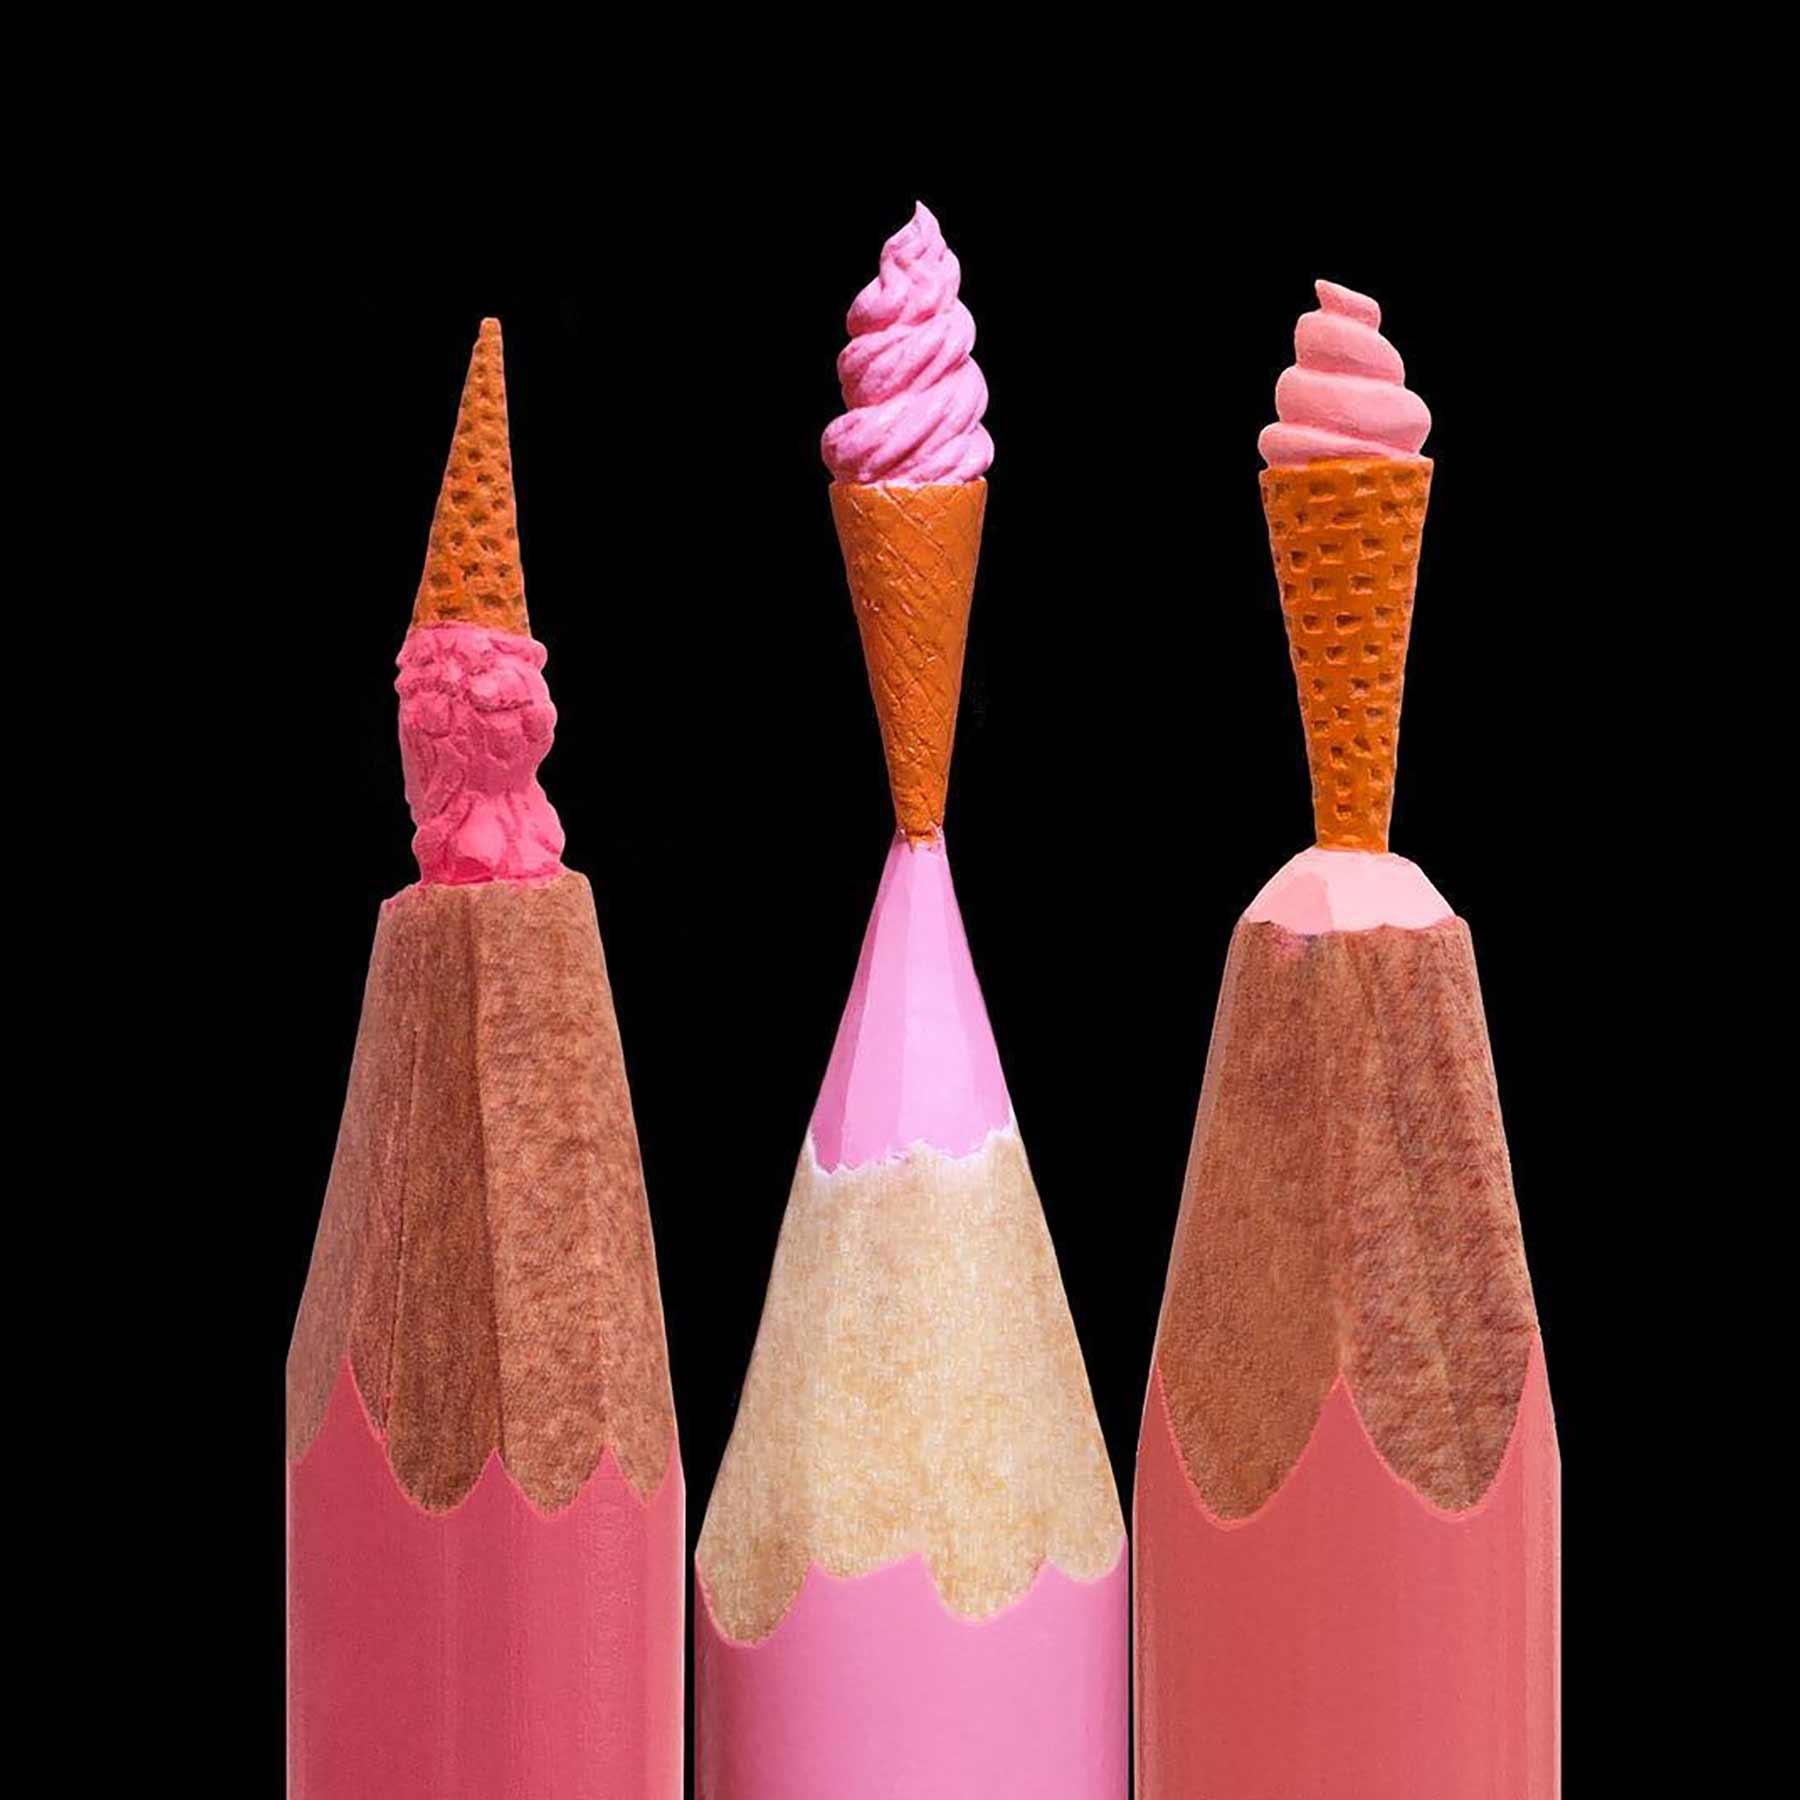 Miniatur-Skultpuren aus Stiftminen von Salavat Fidai minen-miniatur-skulpturen-Salavat-Fidai_03